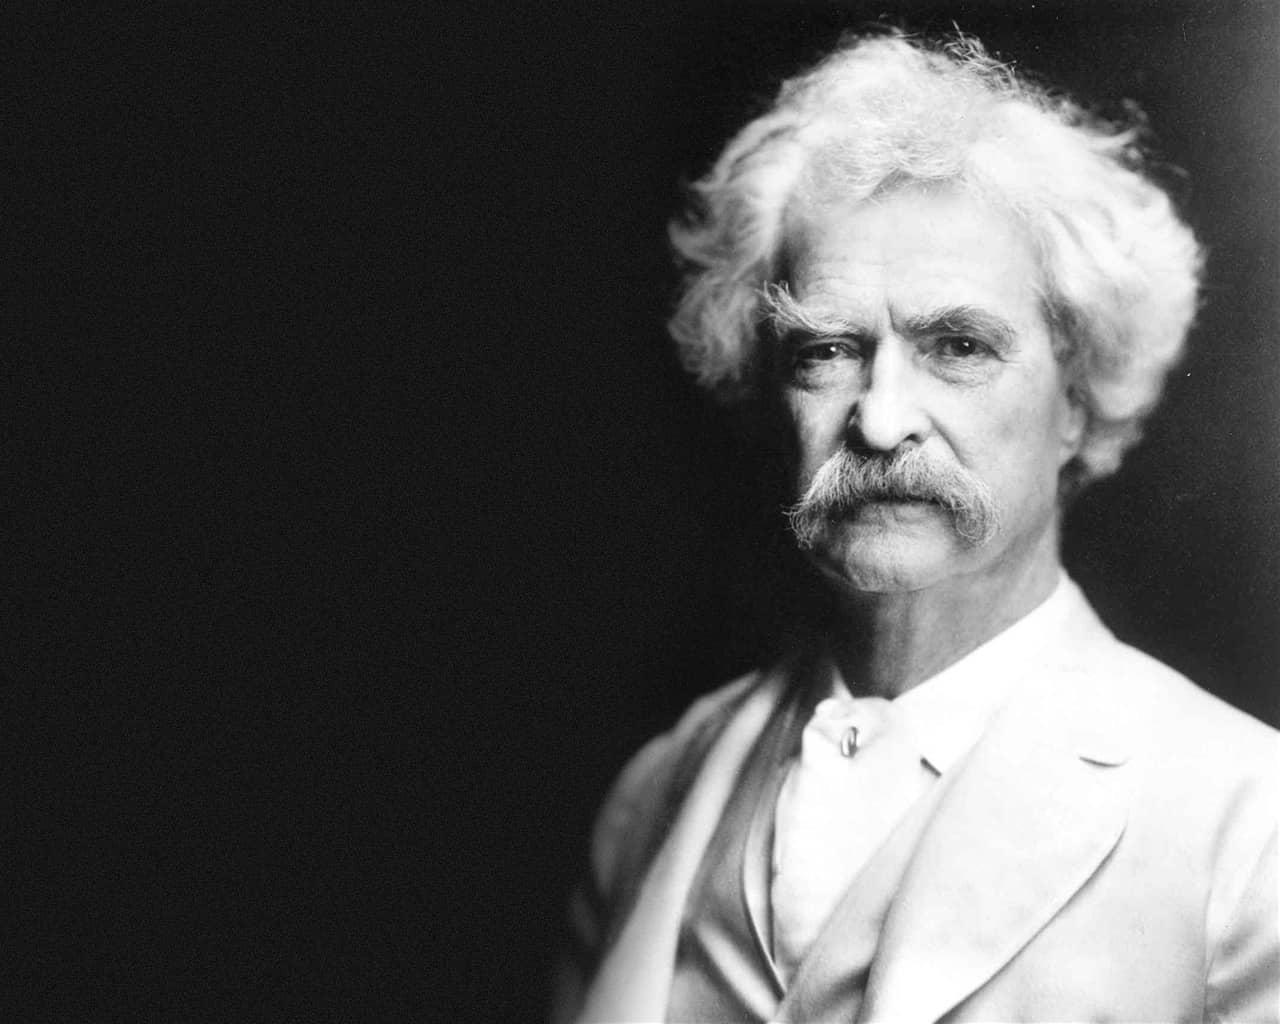 Mark Twain Is From Virginia City NV.